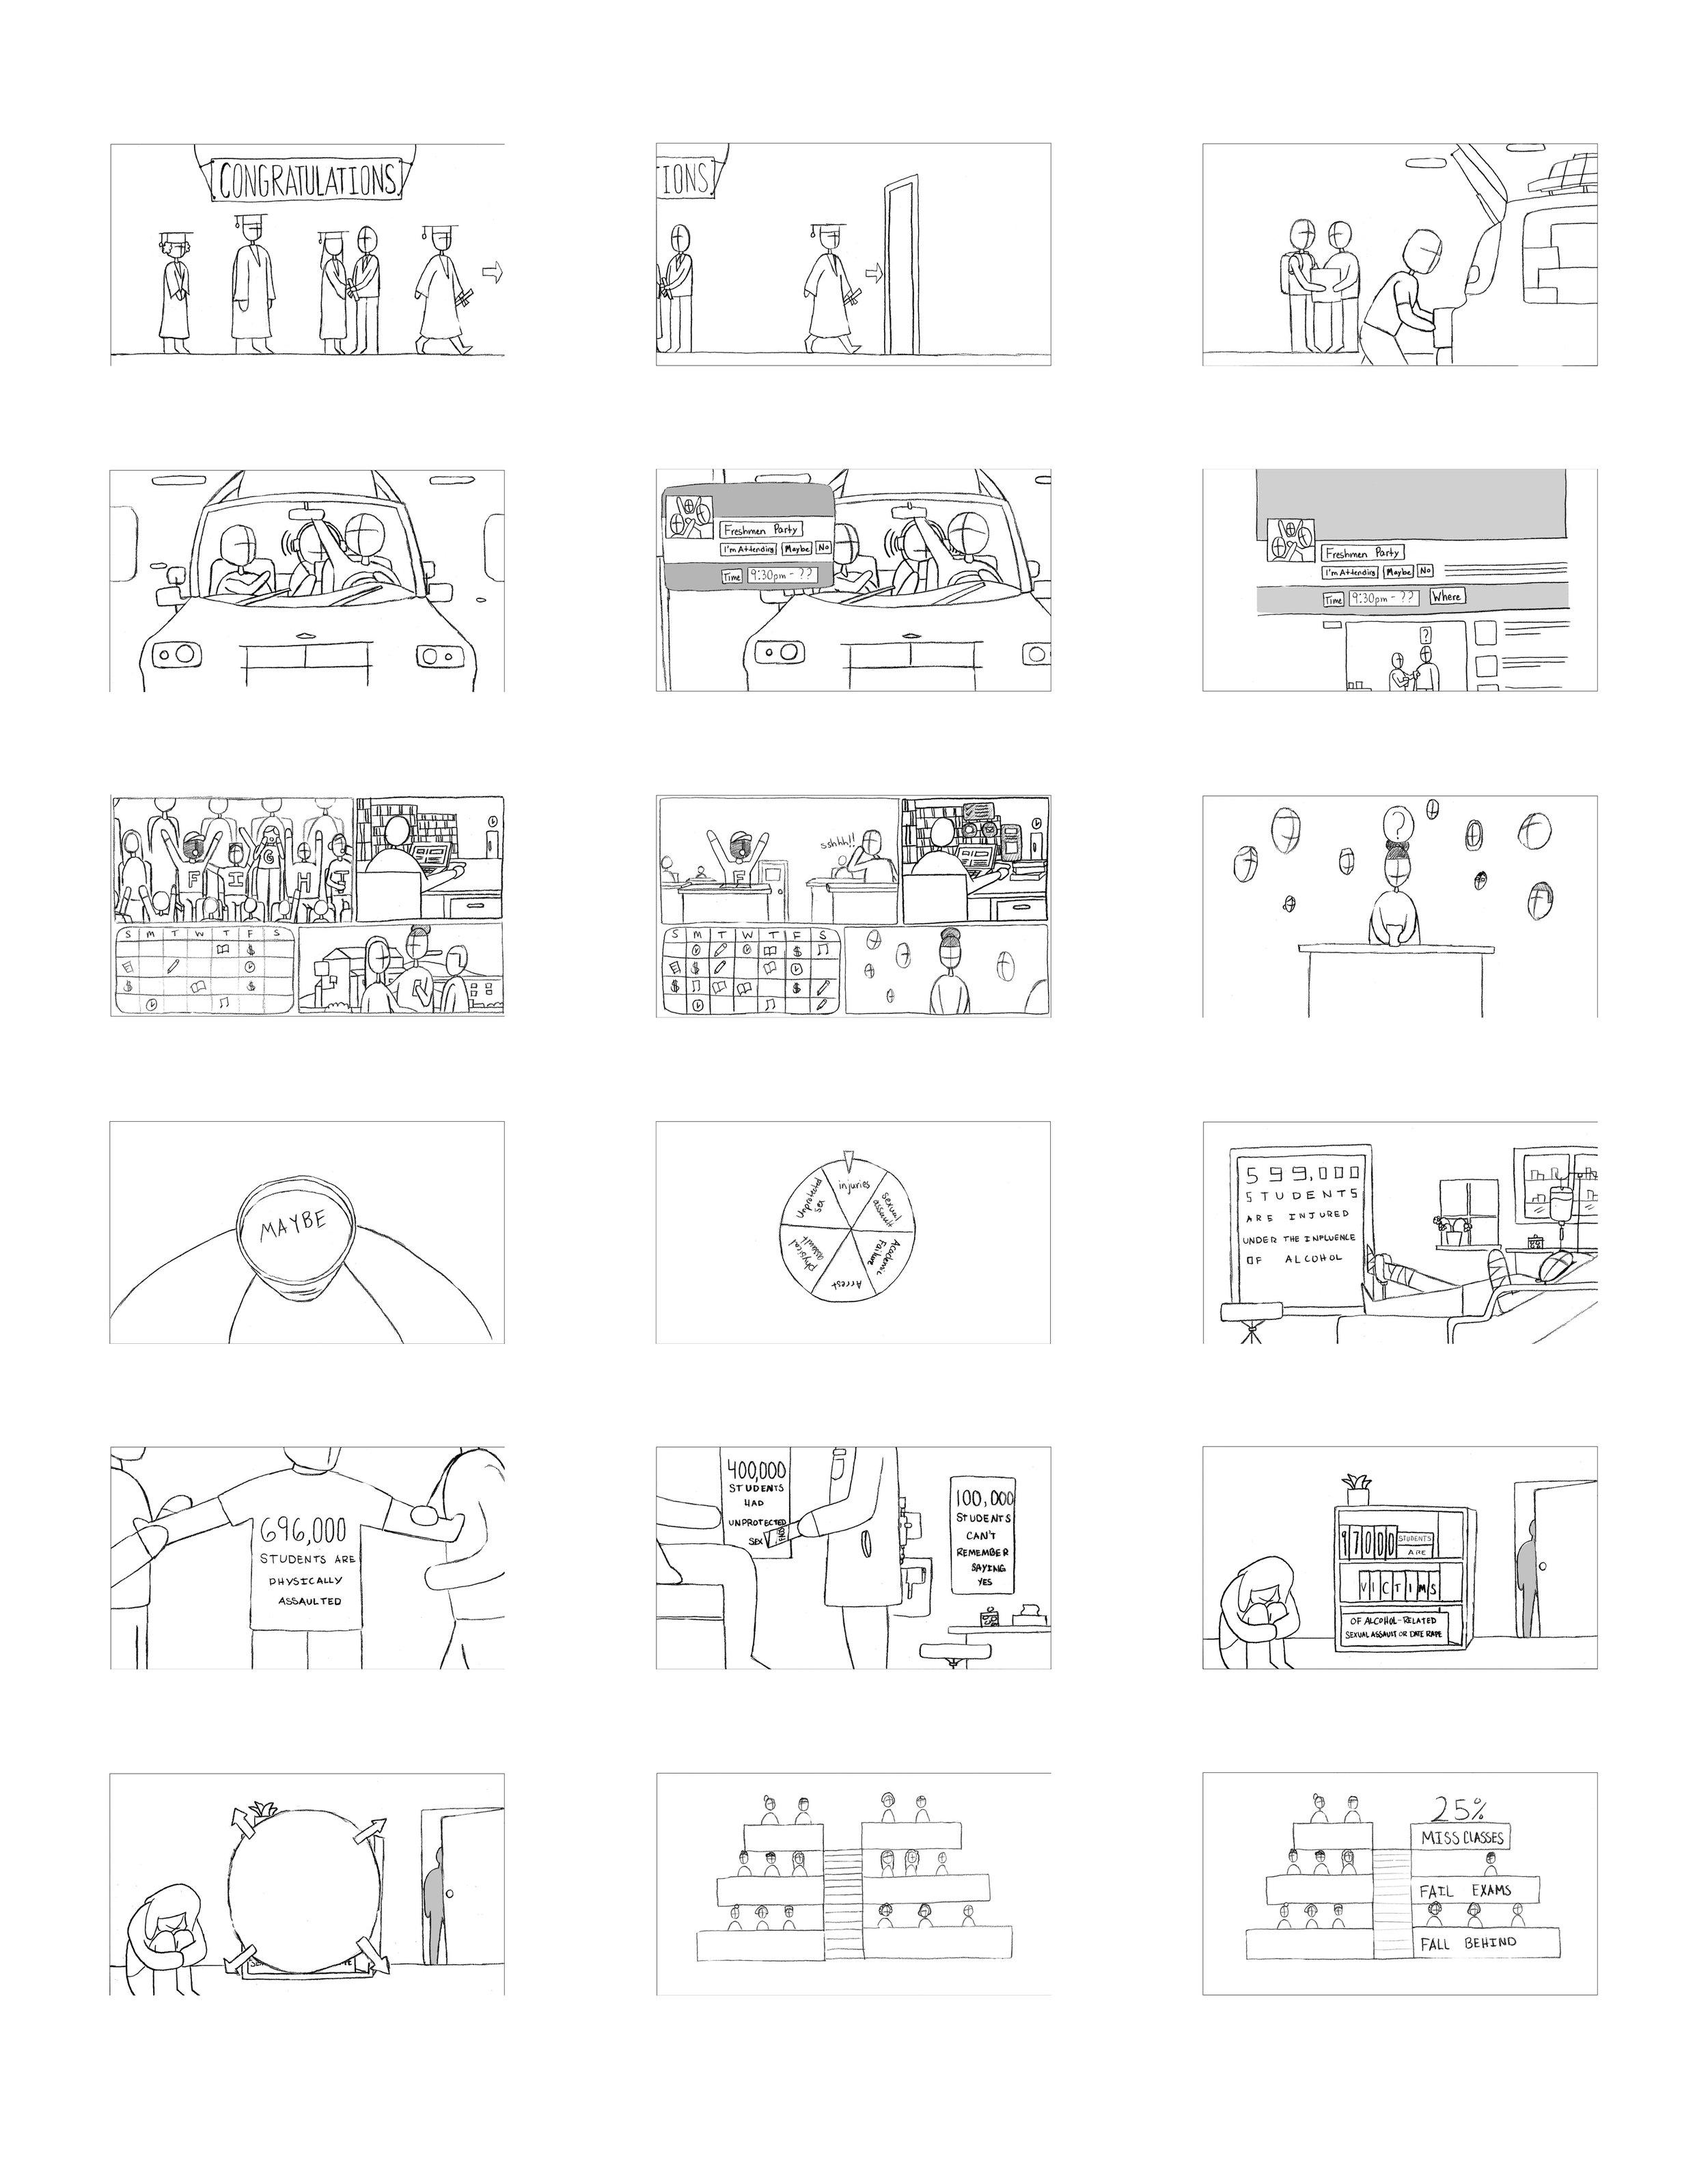 UAD_Transition_Storyboard_01_v01.jpg